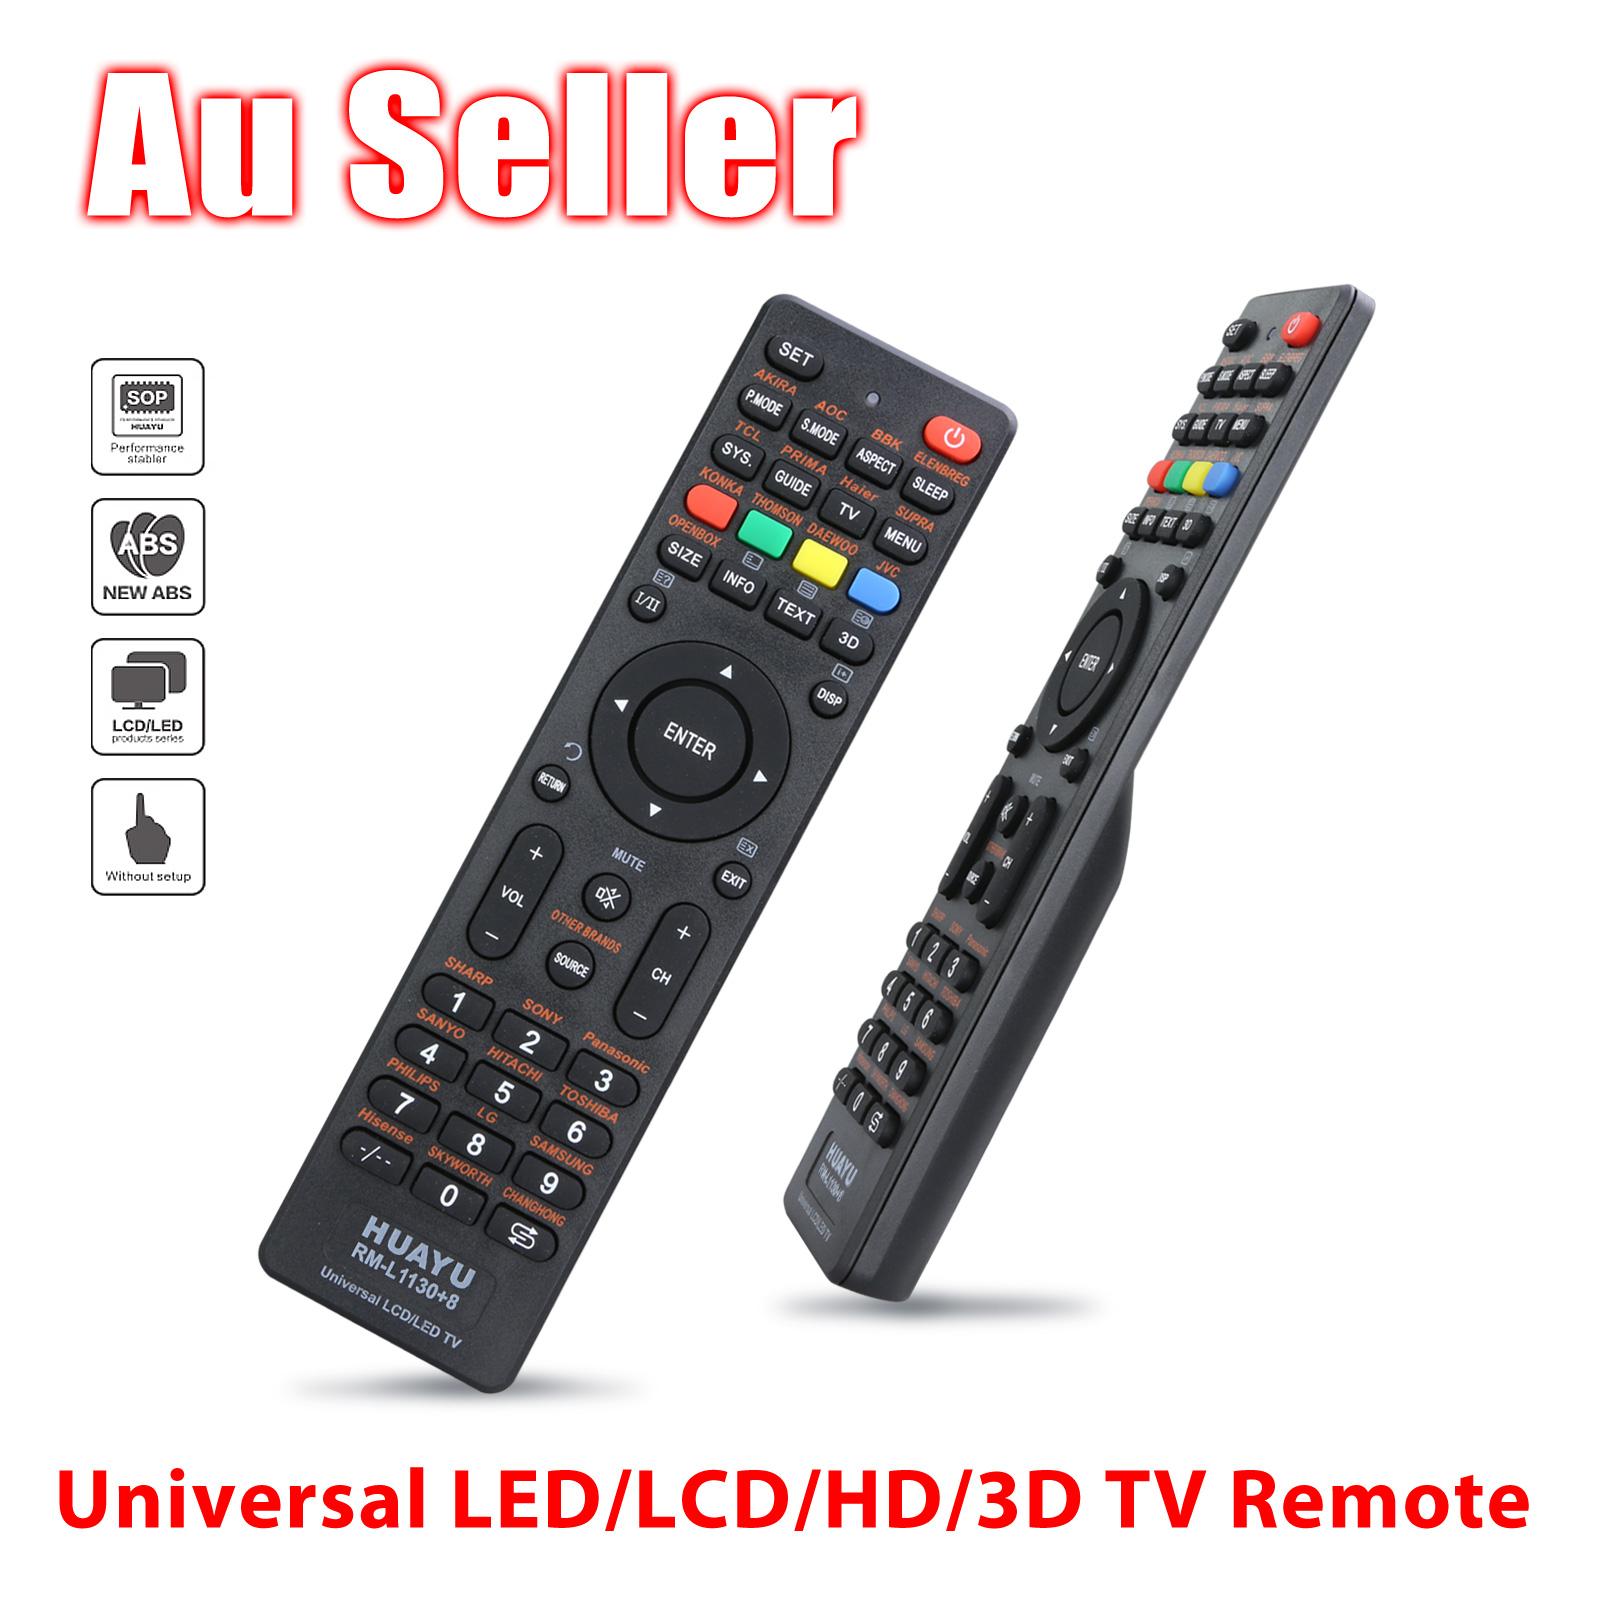 panasonic tv controller. universal lcd led hd 3d tv remote control for sony samsung panasonic jvc lg panasonic tv controller